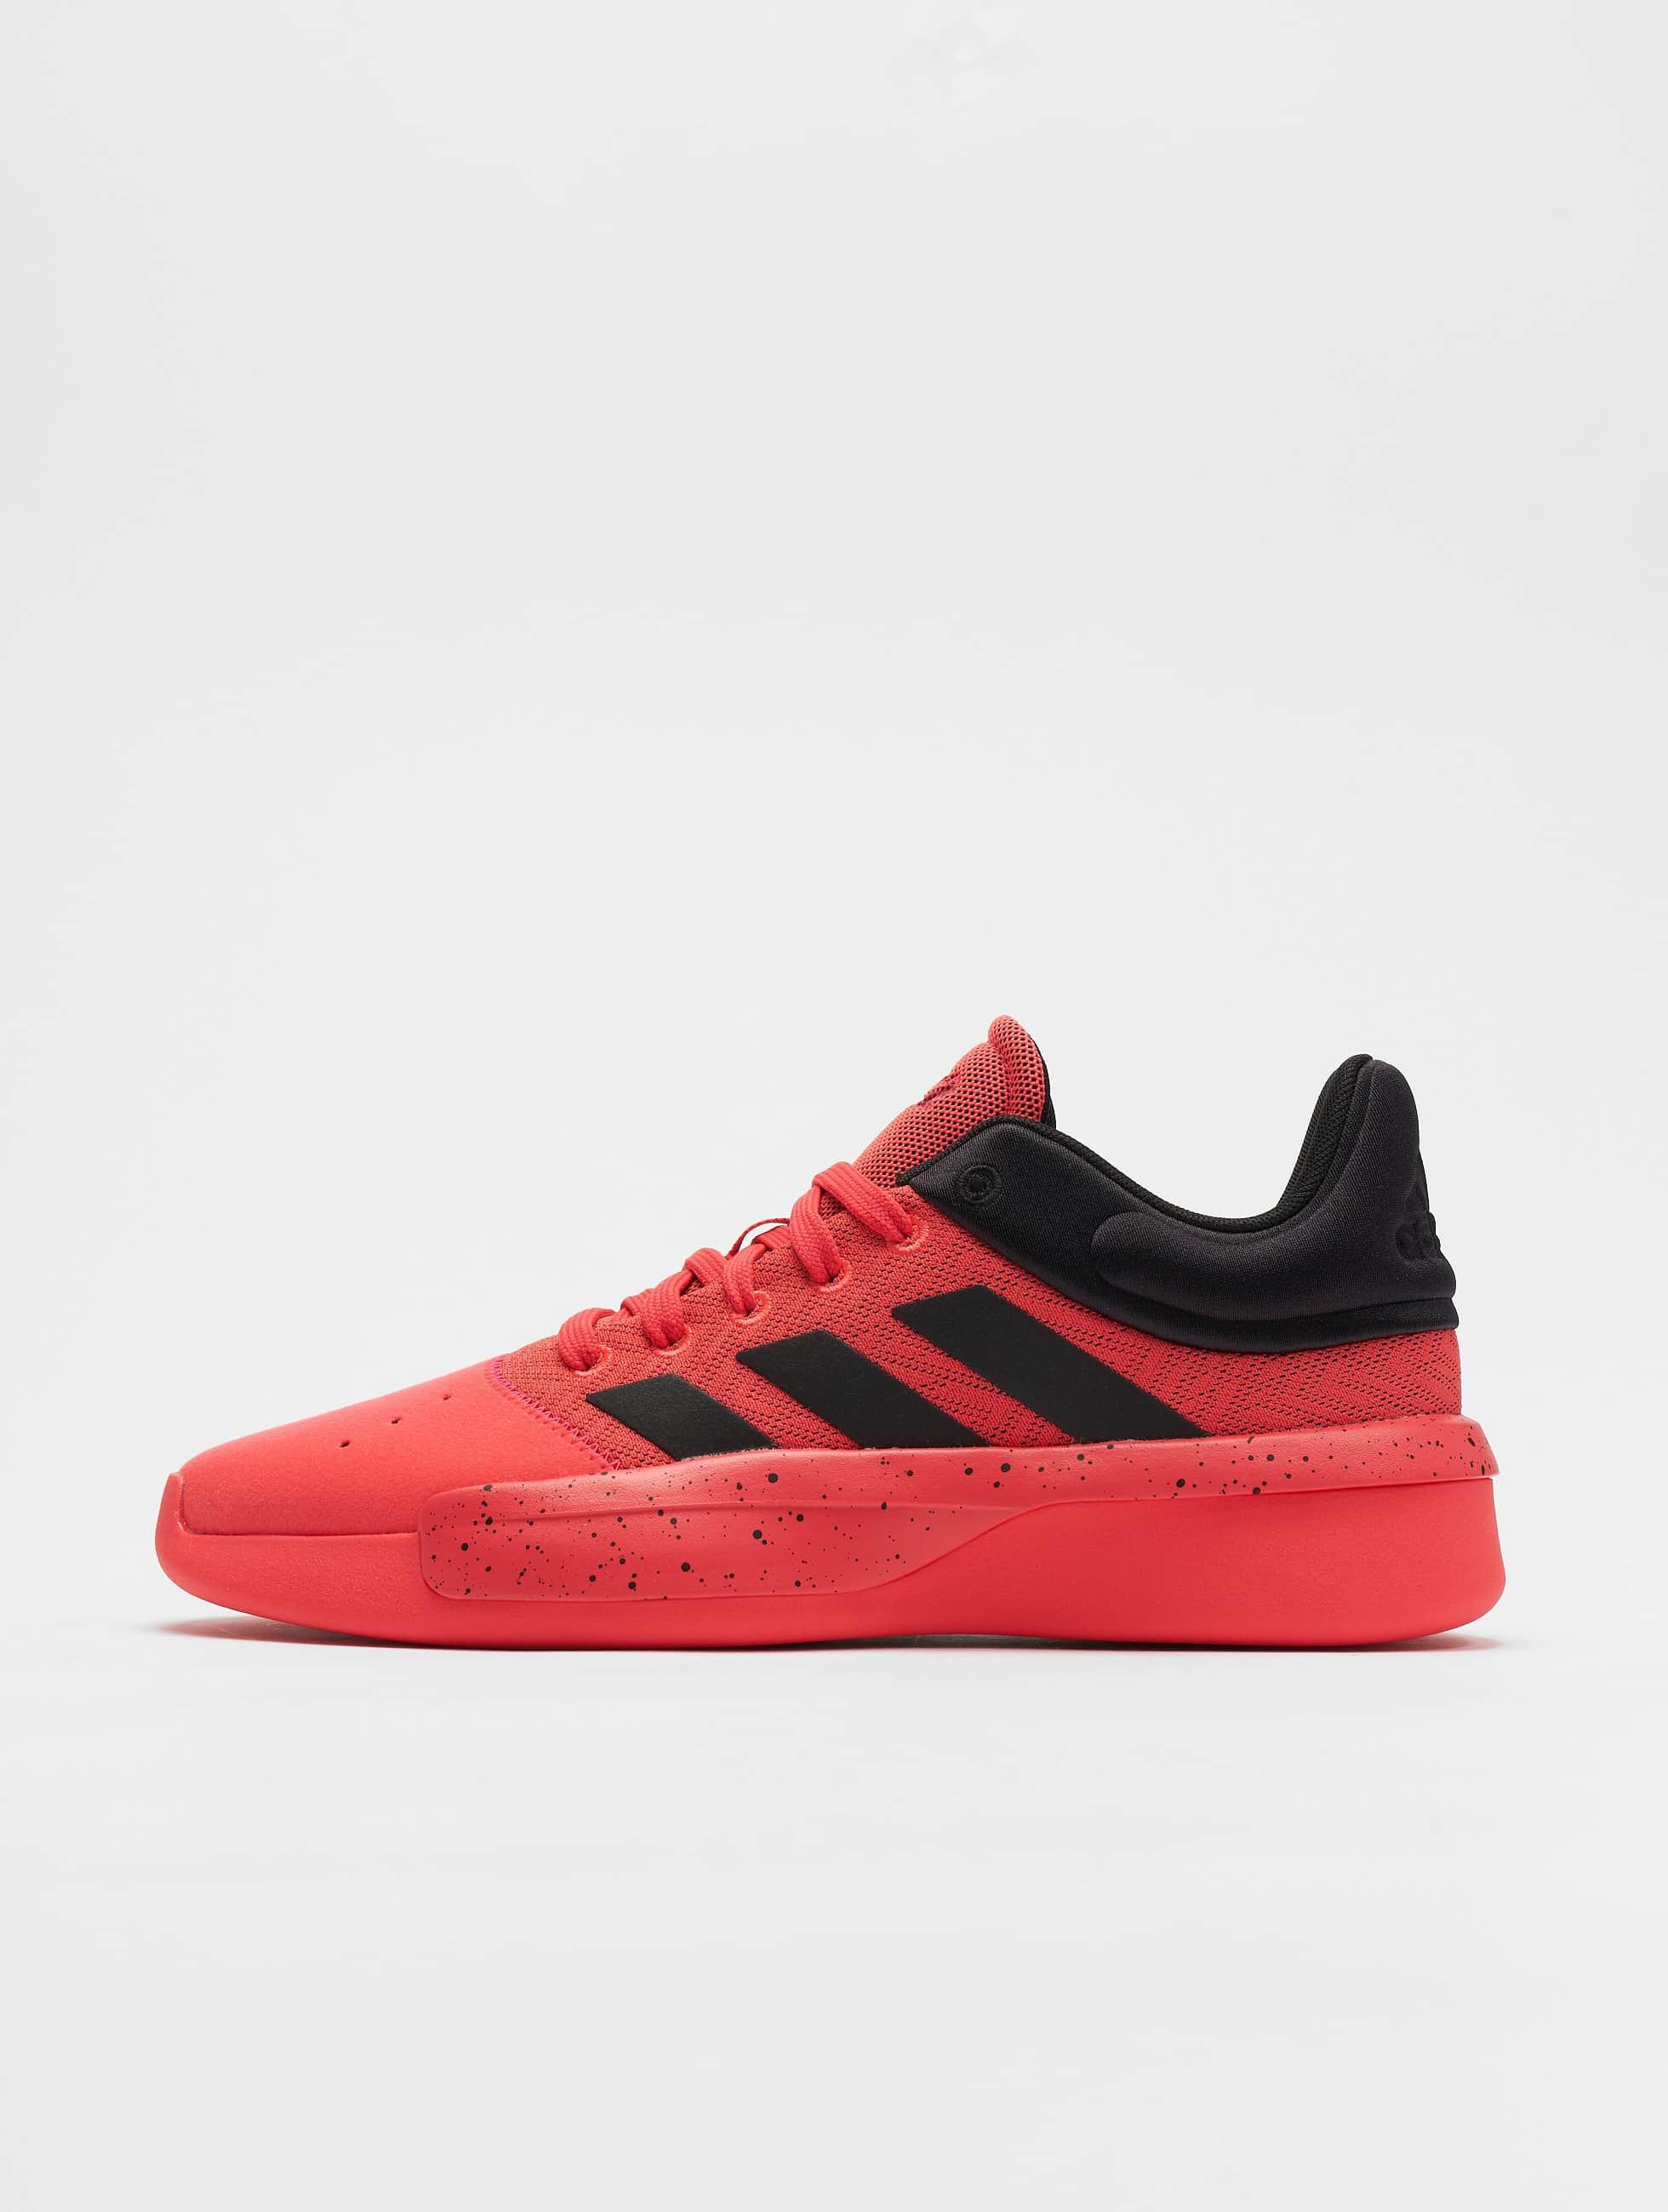 adidas Pro Adversary Low 2 Basketball Shoes ShoredCore BlackShored